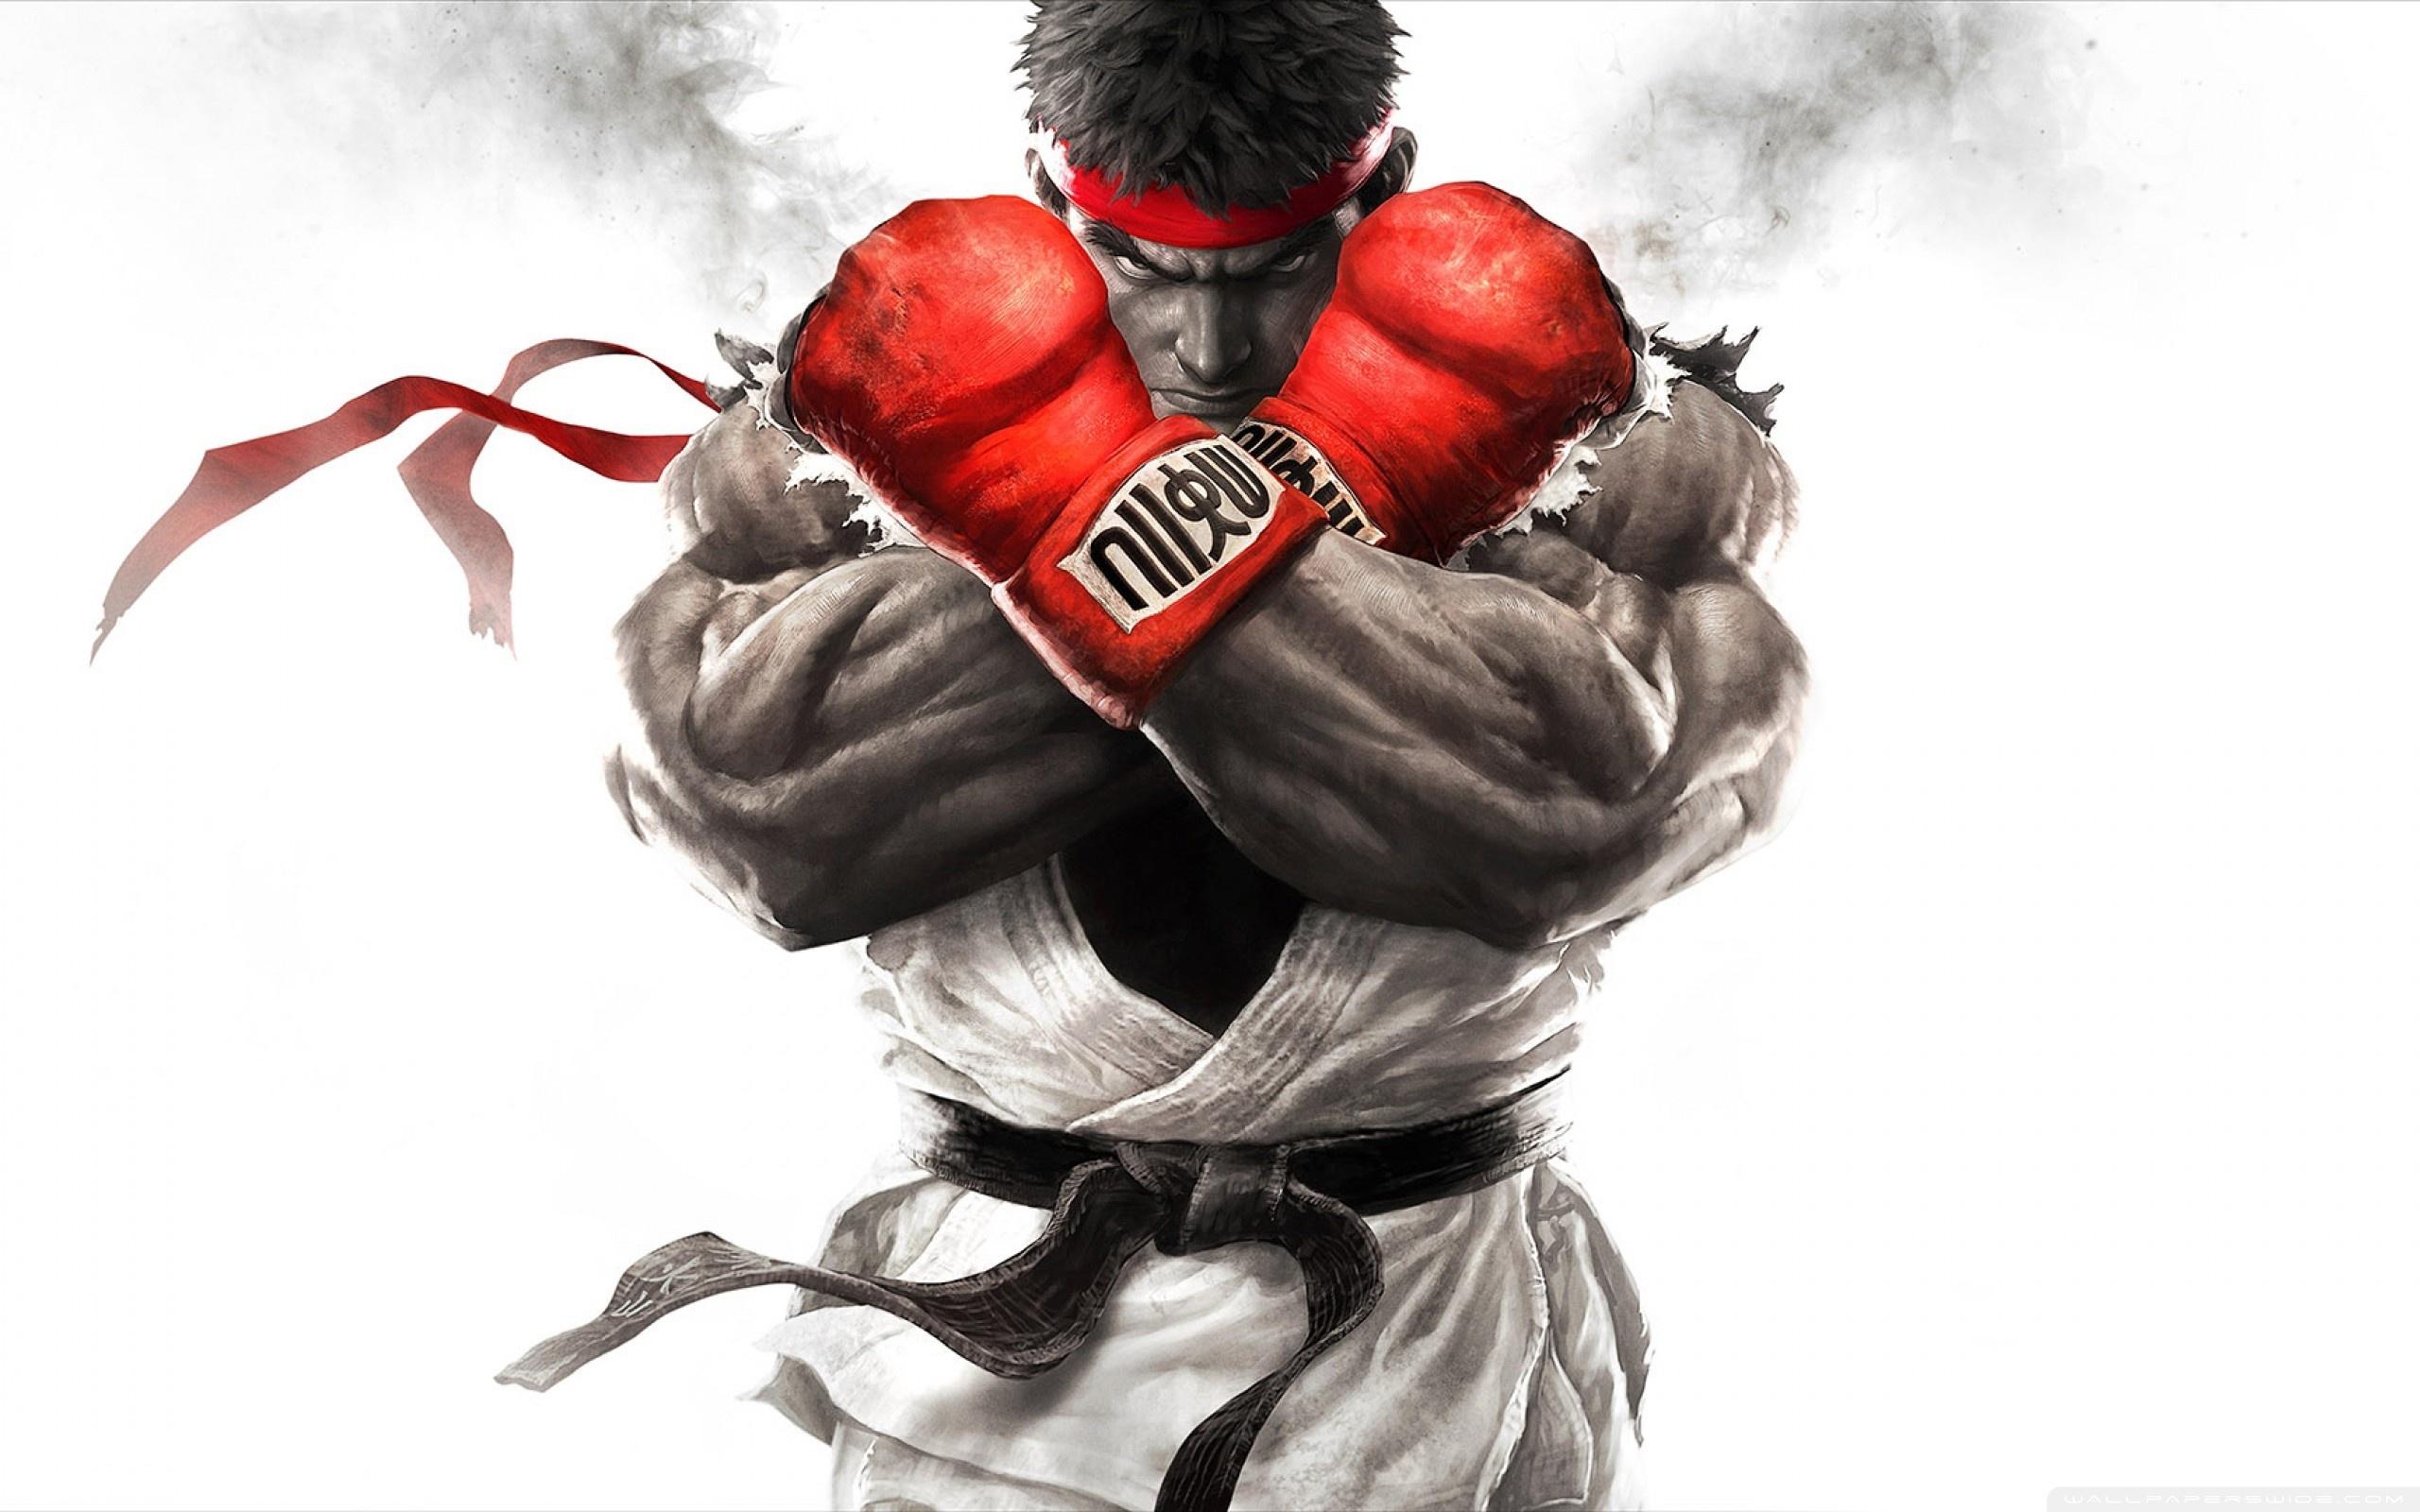 street fighter v 2015 ❤ 4k hd desktop wallpaper for 4k ultra hd tv